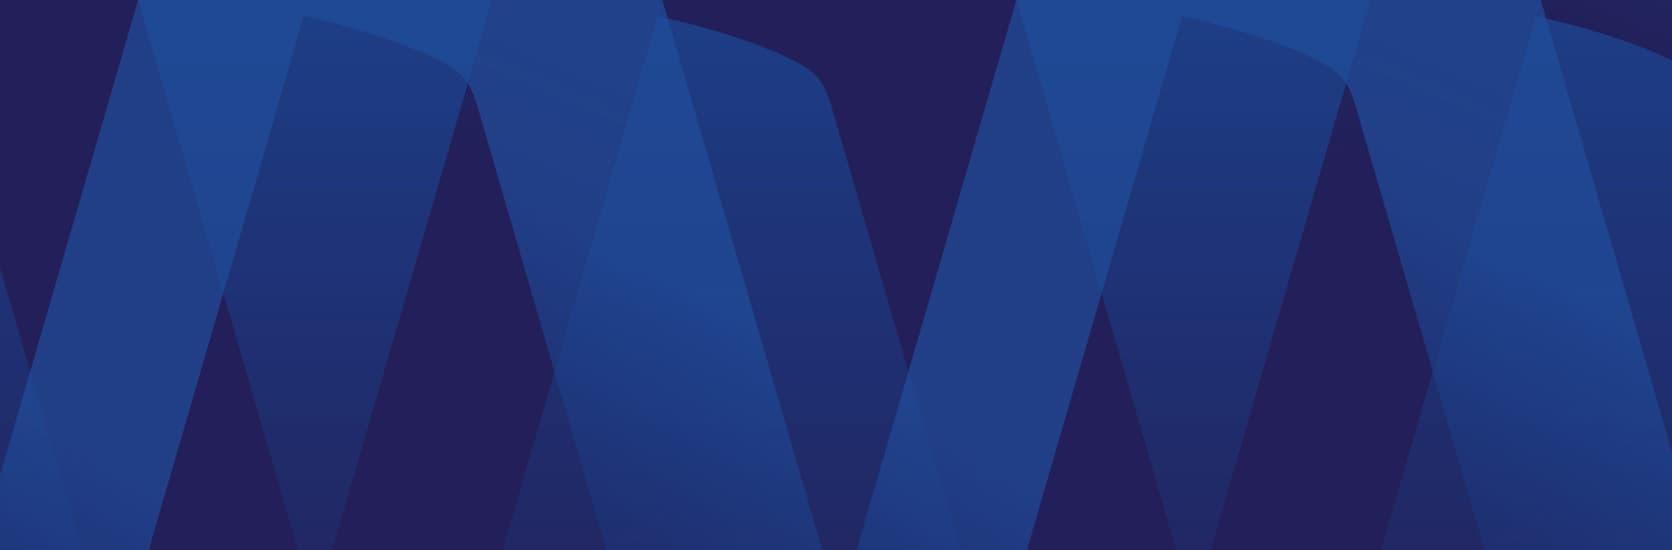 Visa University Internal Brand - Blue pattern